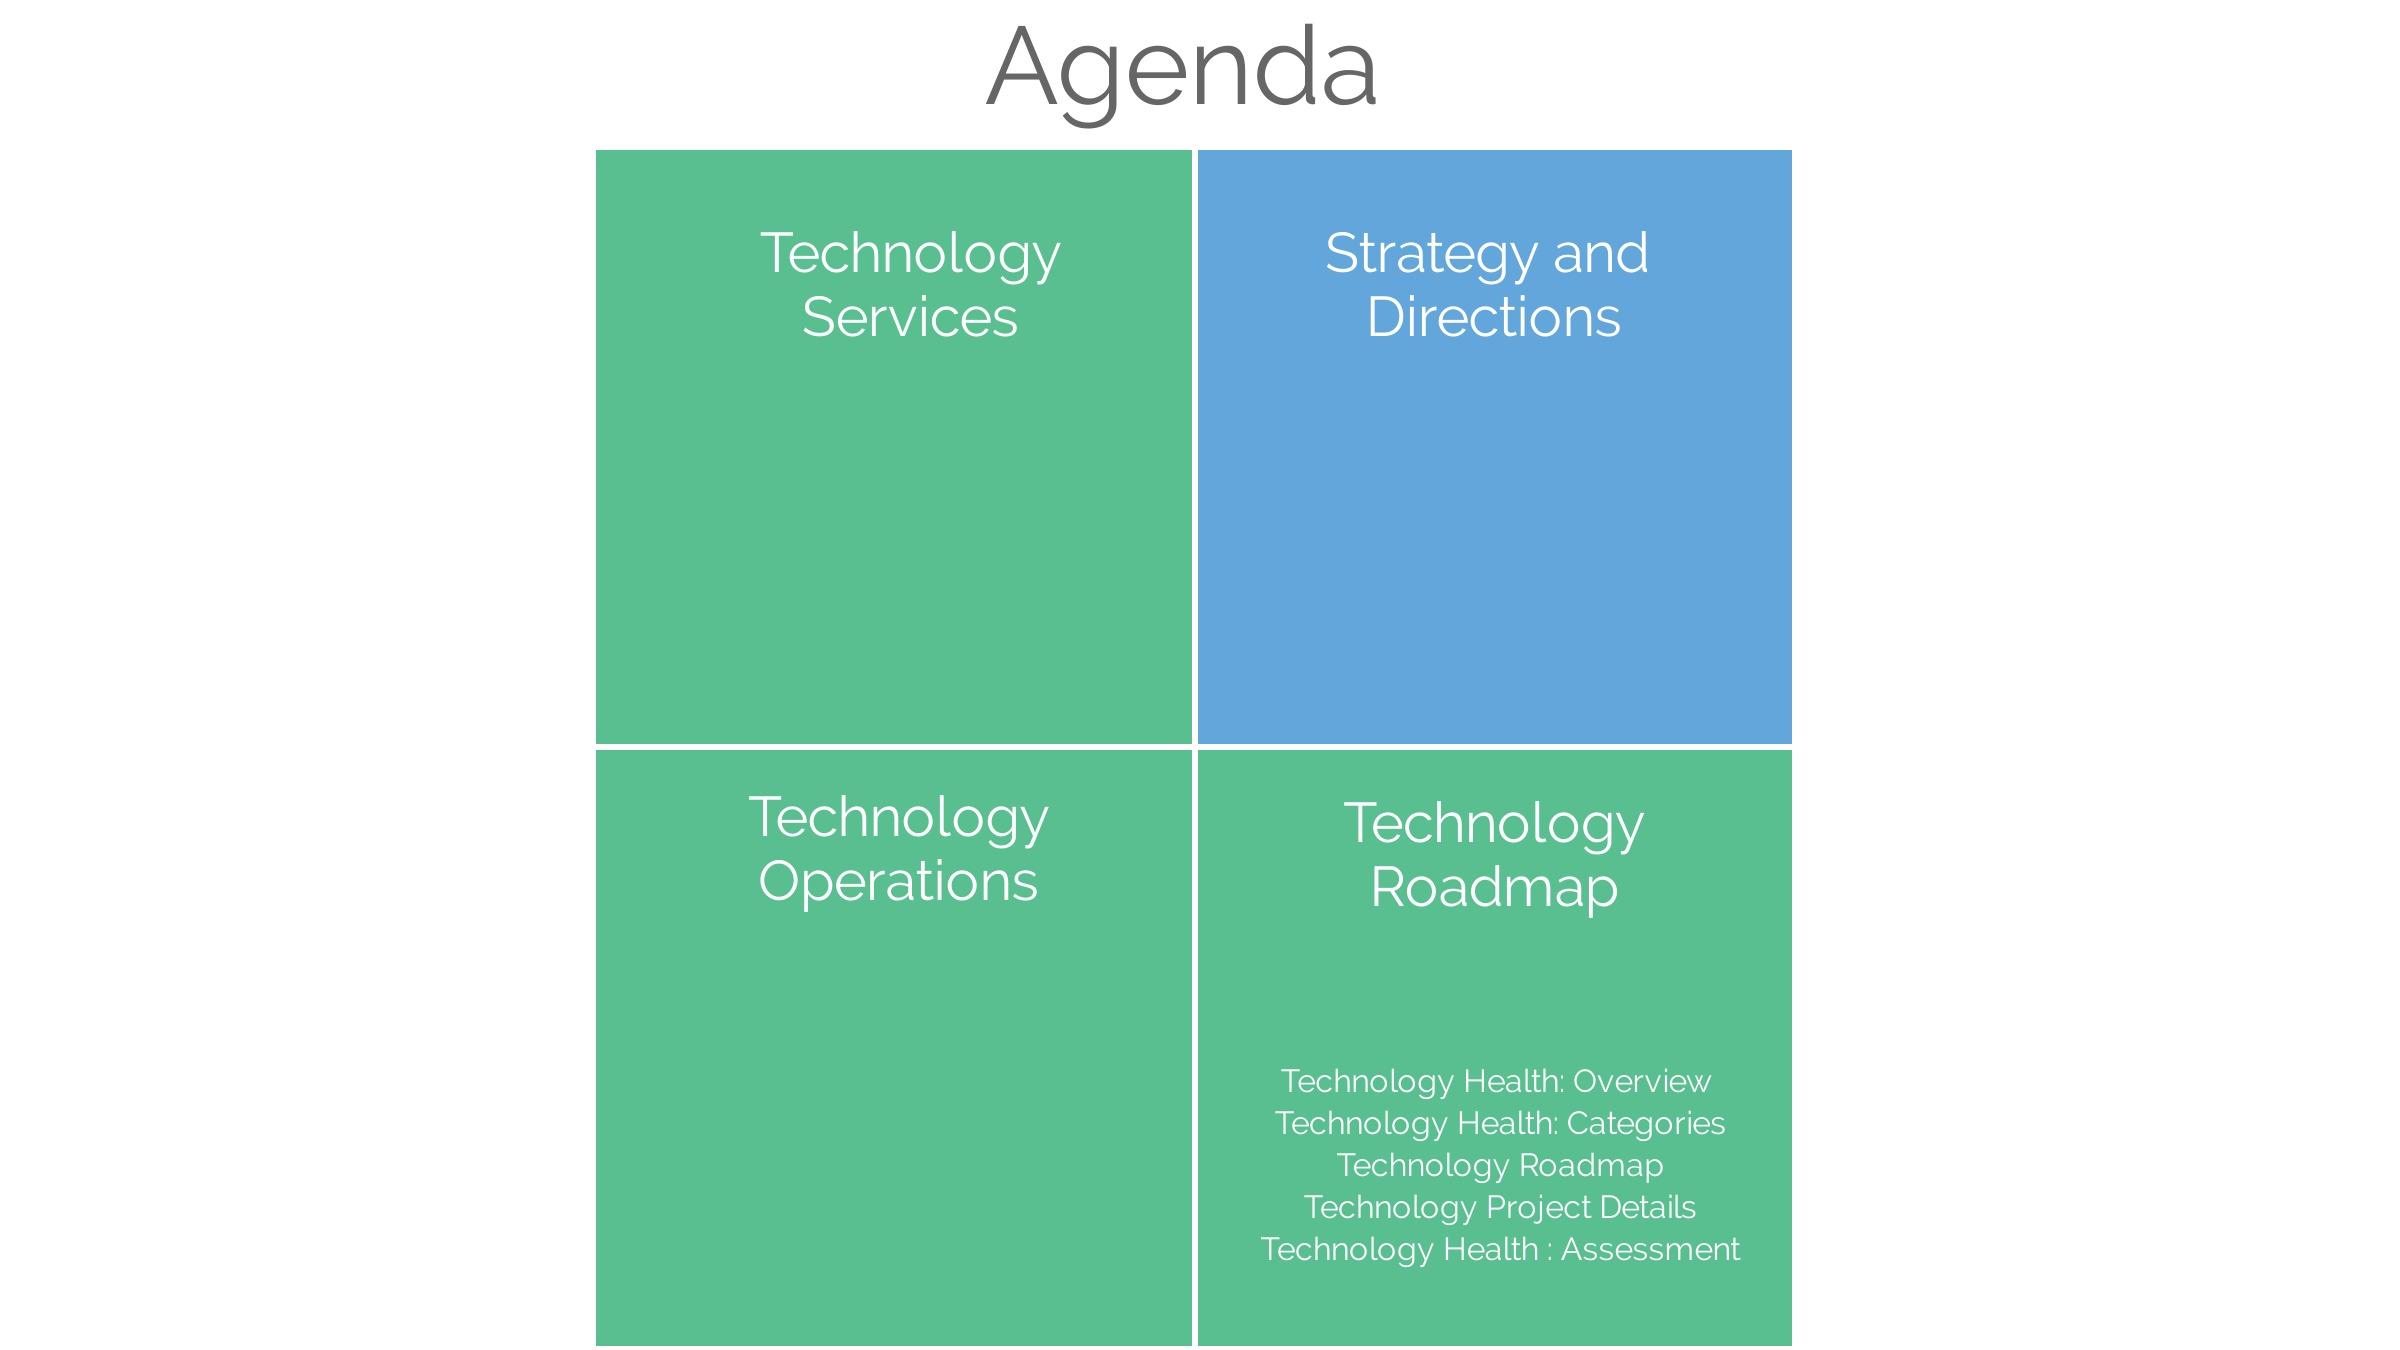 Basic QBR agenda